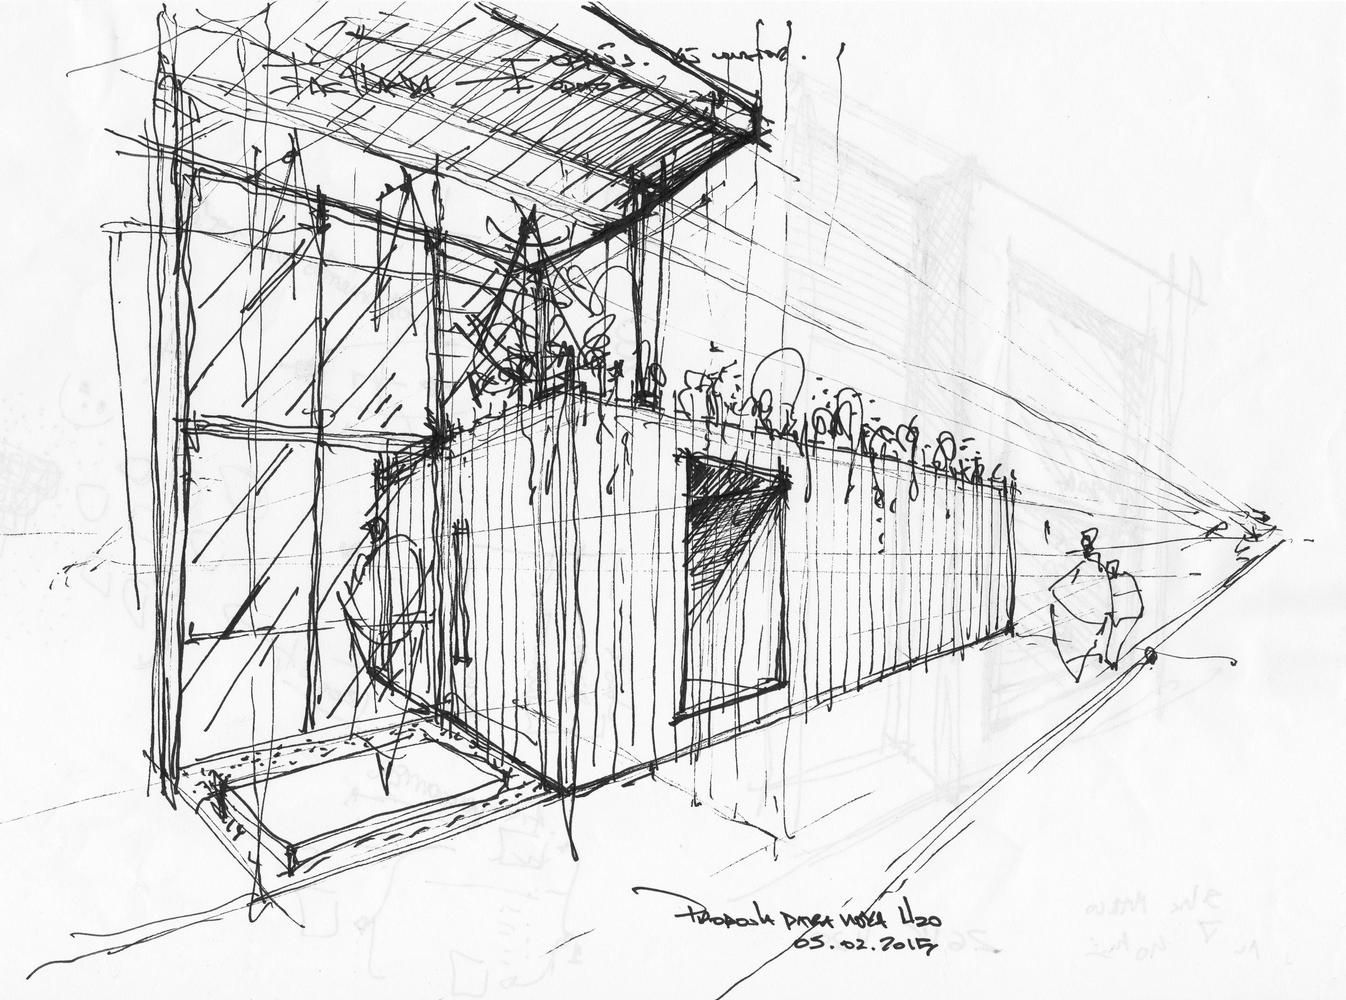 Galería de Loja Conceito / H²O Arquitetura - 21 | Croquis arquitectura, Bocetos  arquitectónicos, Dibujos de arquitectura concepto